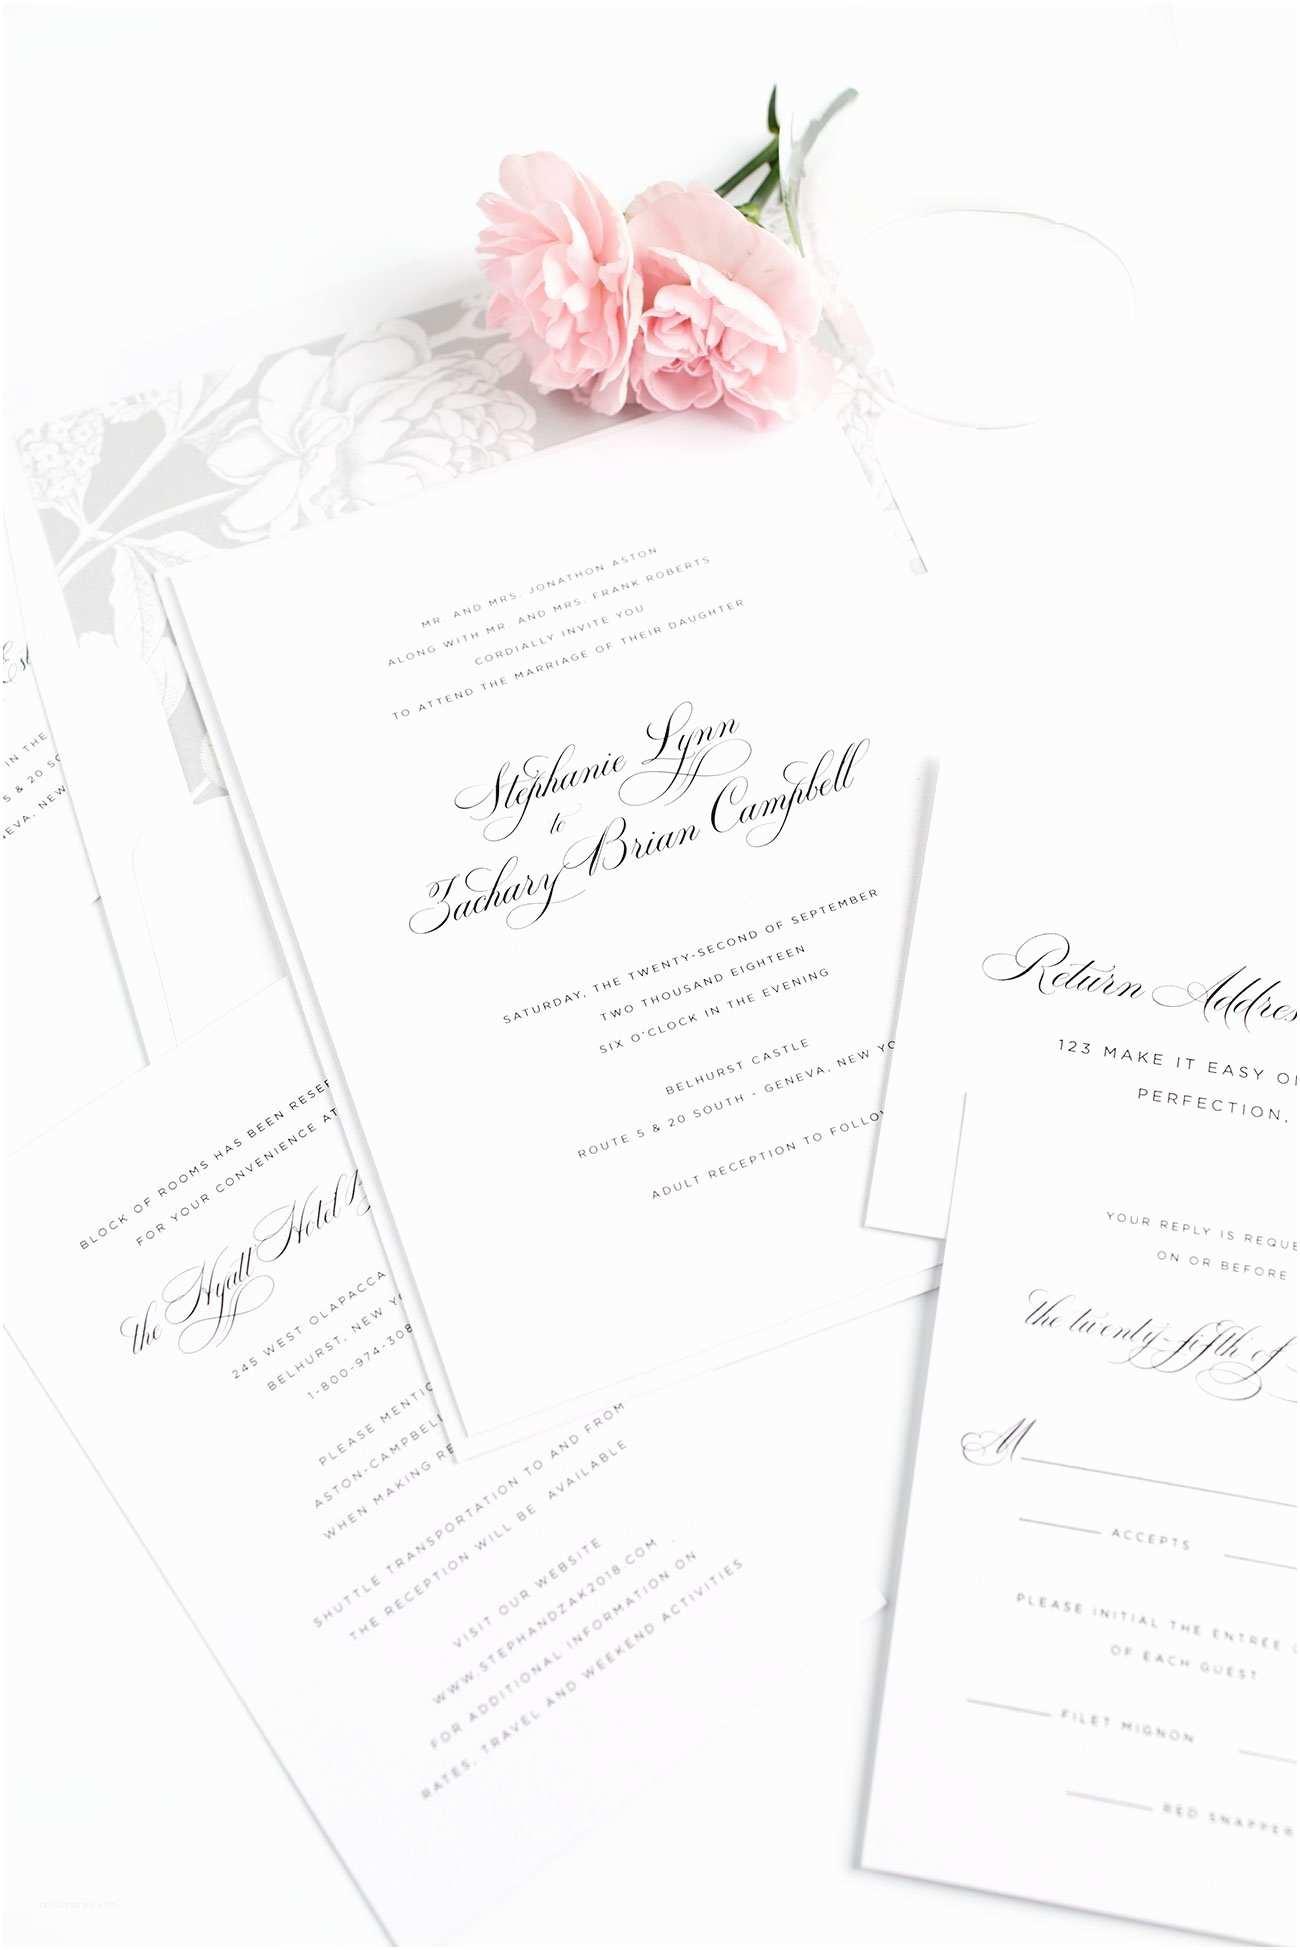 Glamorous Wedding Invitations Delicate Wedding Invitations In Silver – Wedding Invitations